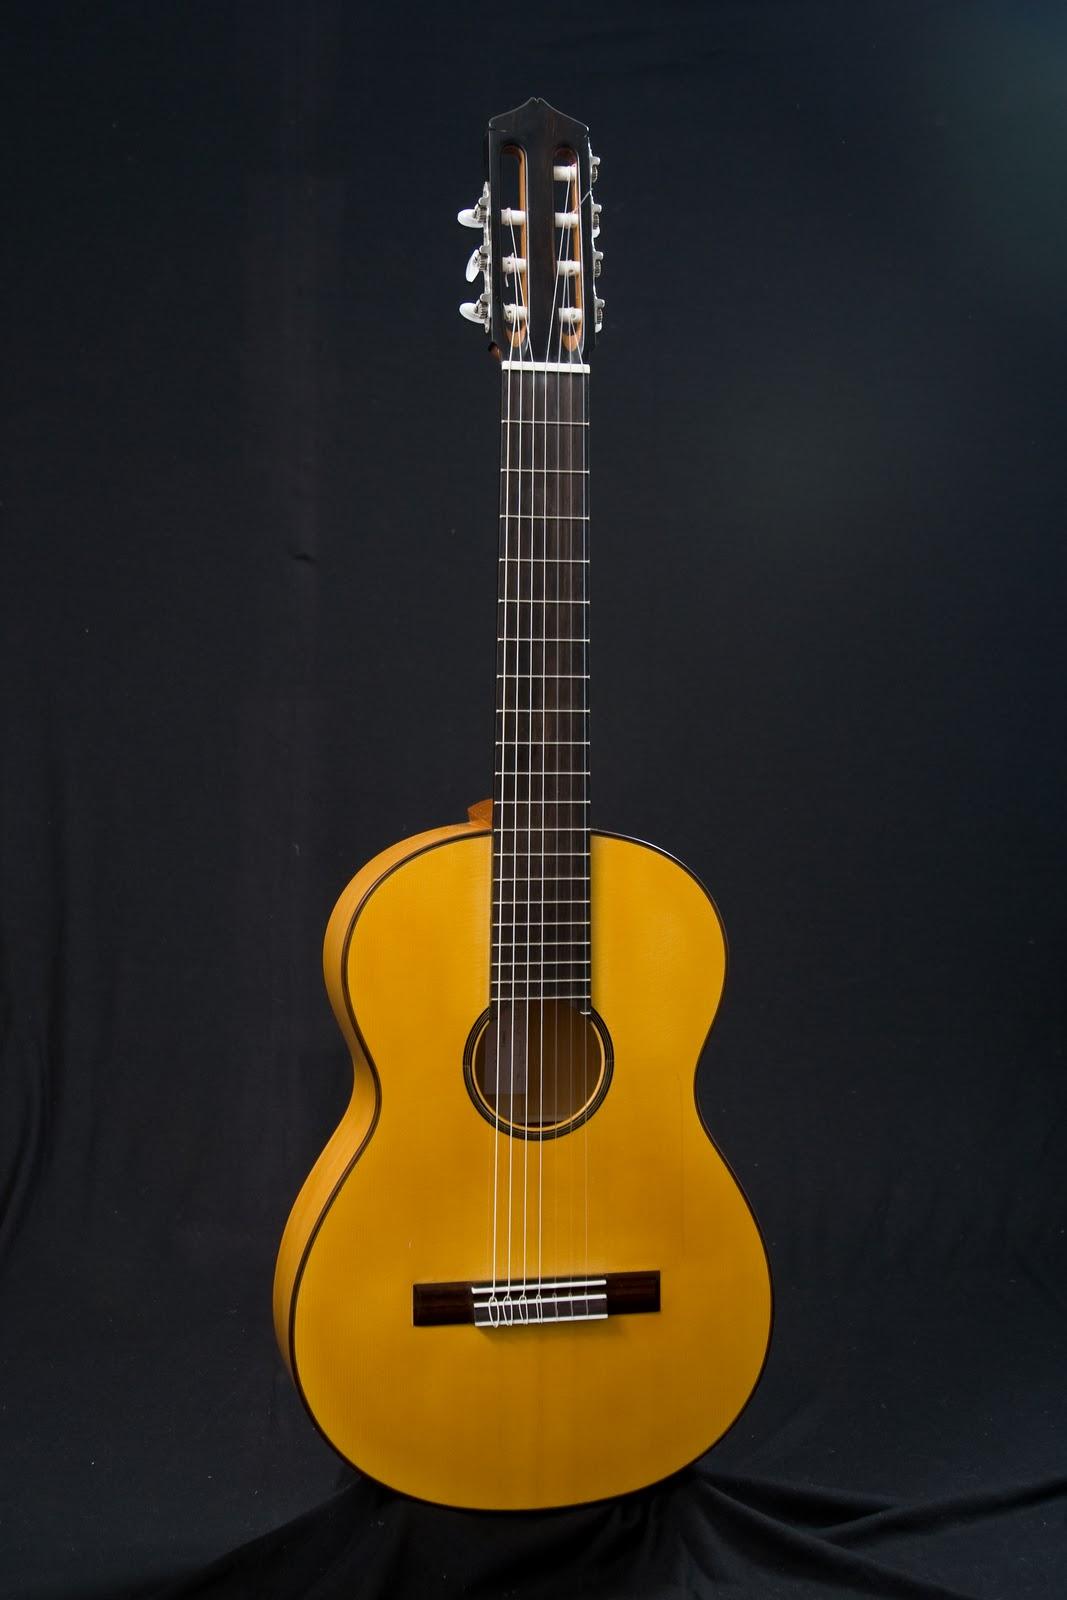 guitarras custom constru das por rodolfo cucculelli luthier 7 string flamenco blanca guitar. Black Bedroom Furniture Sets. Home Design Ideas